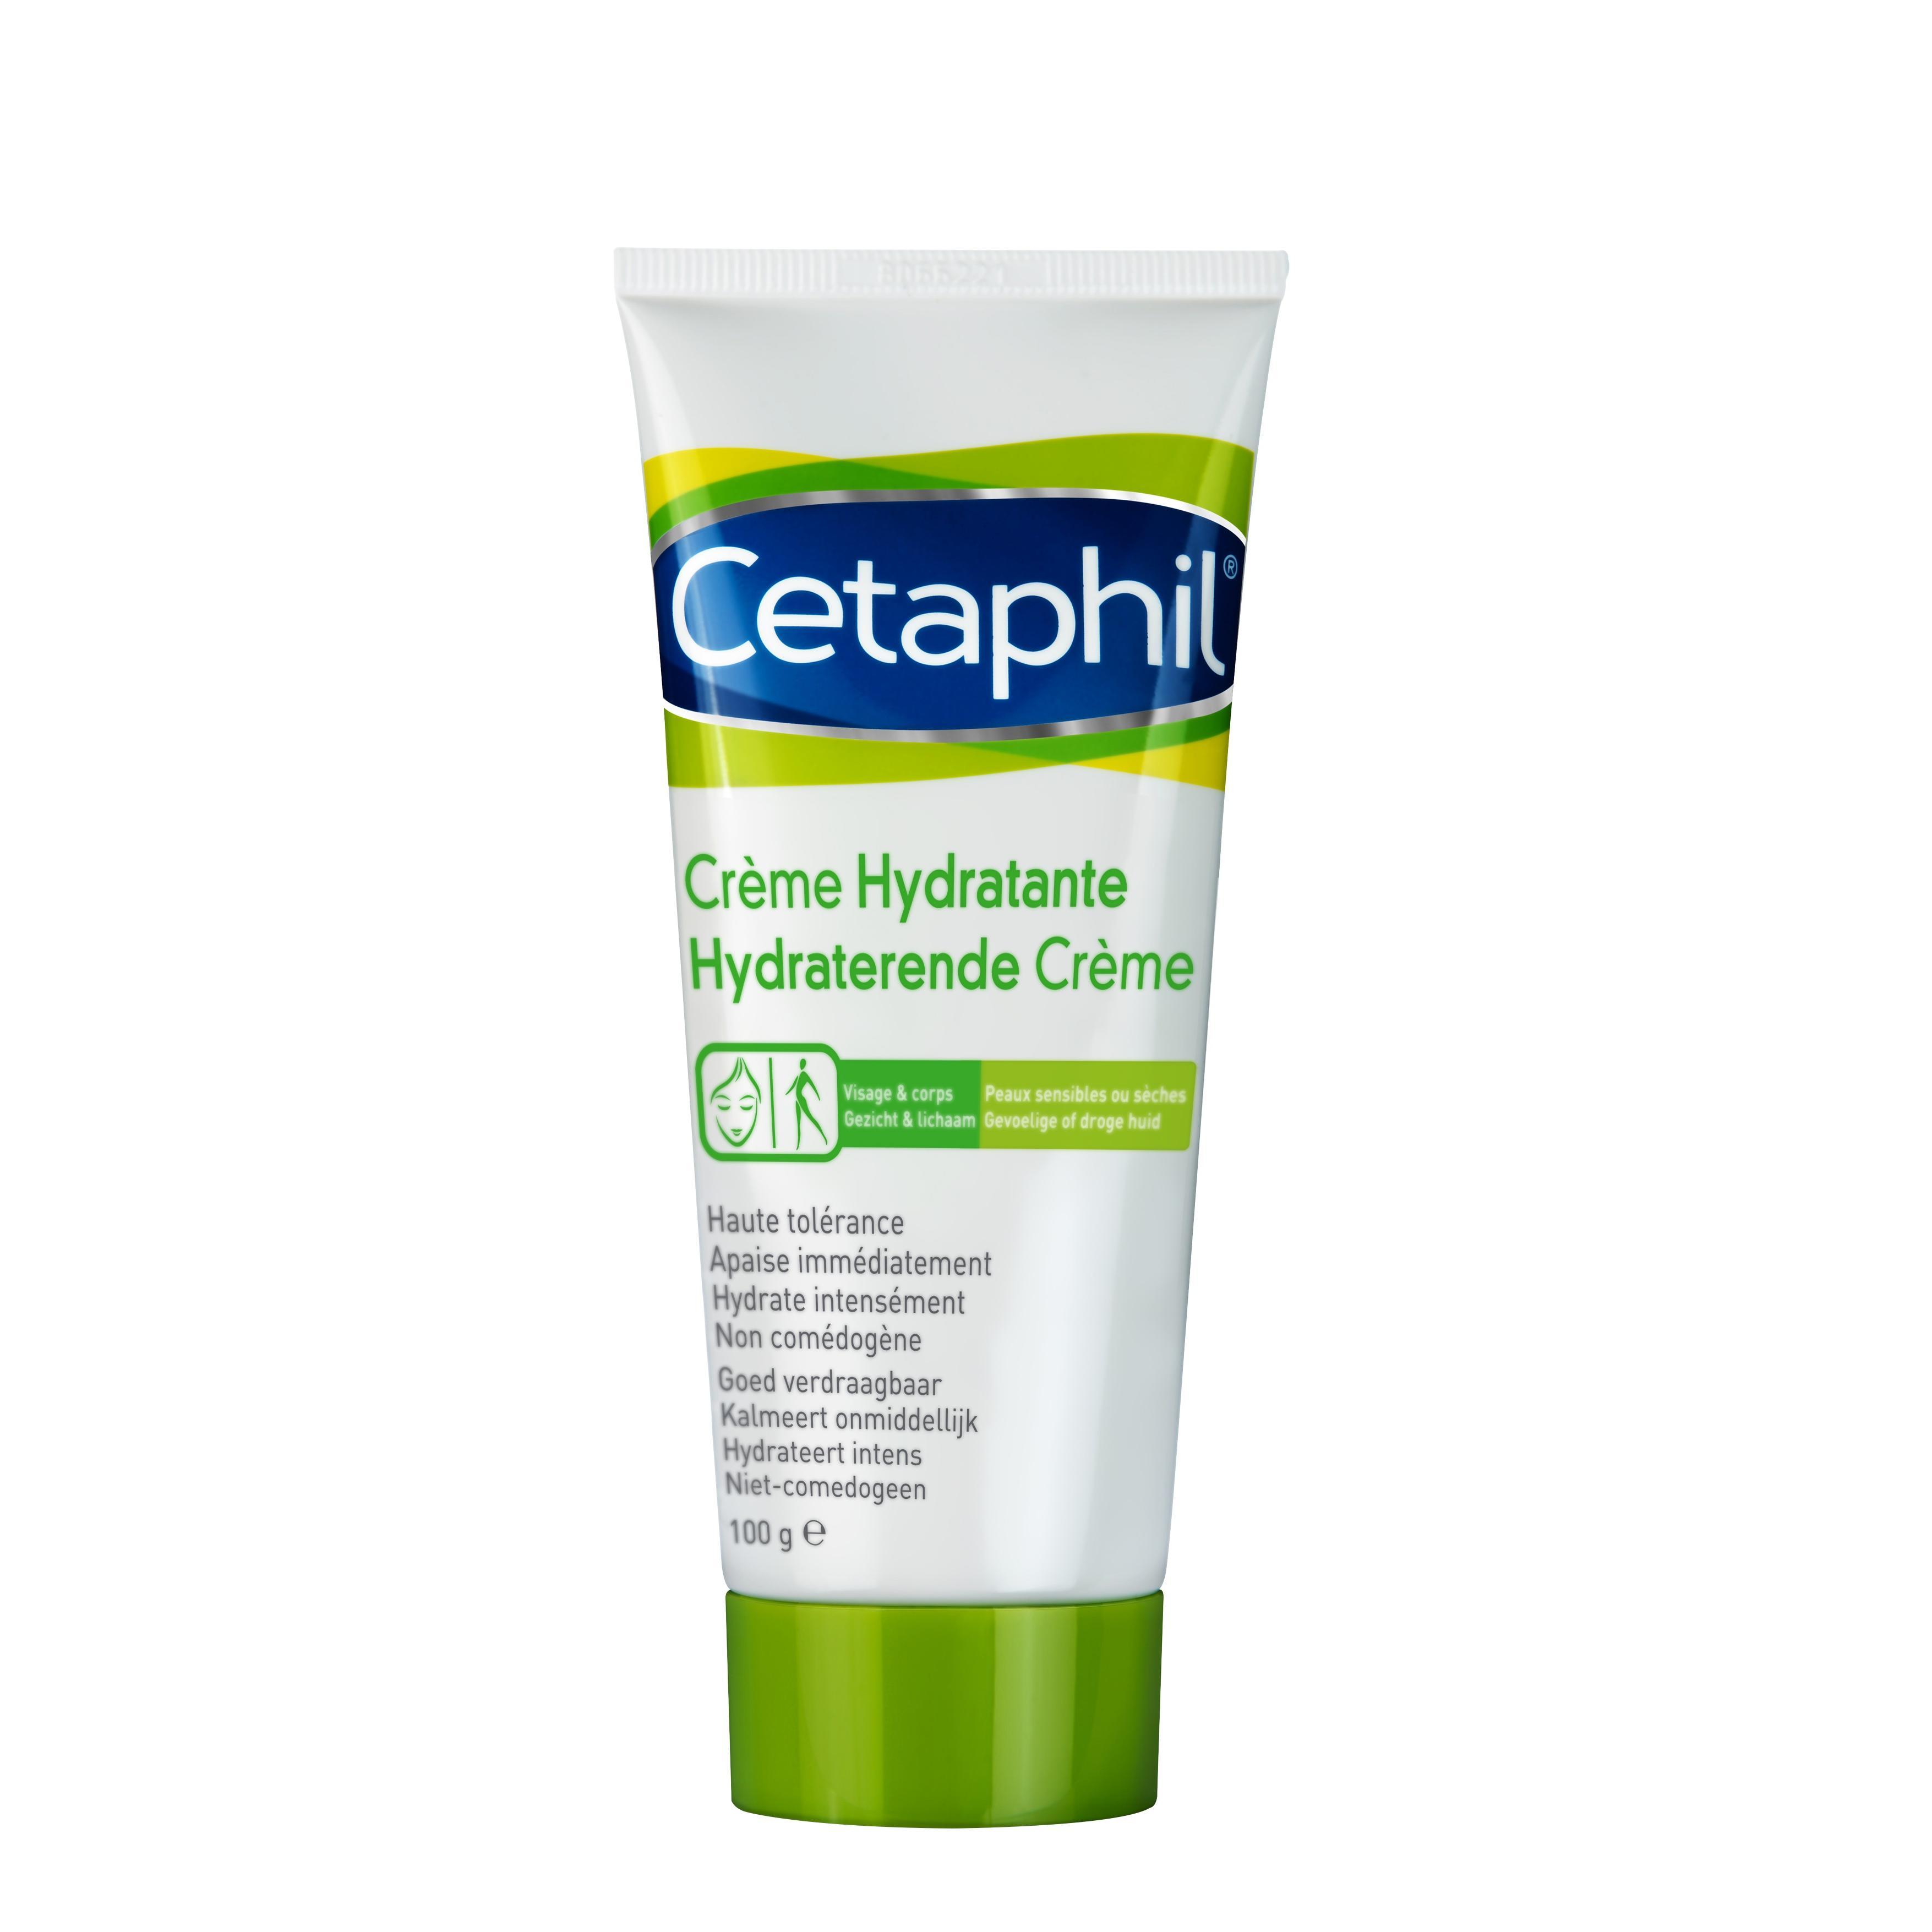 Image of Cetaphil crème hydratante tube